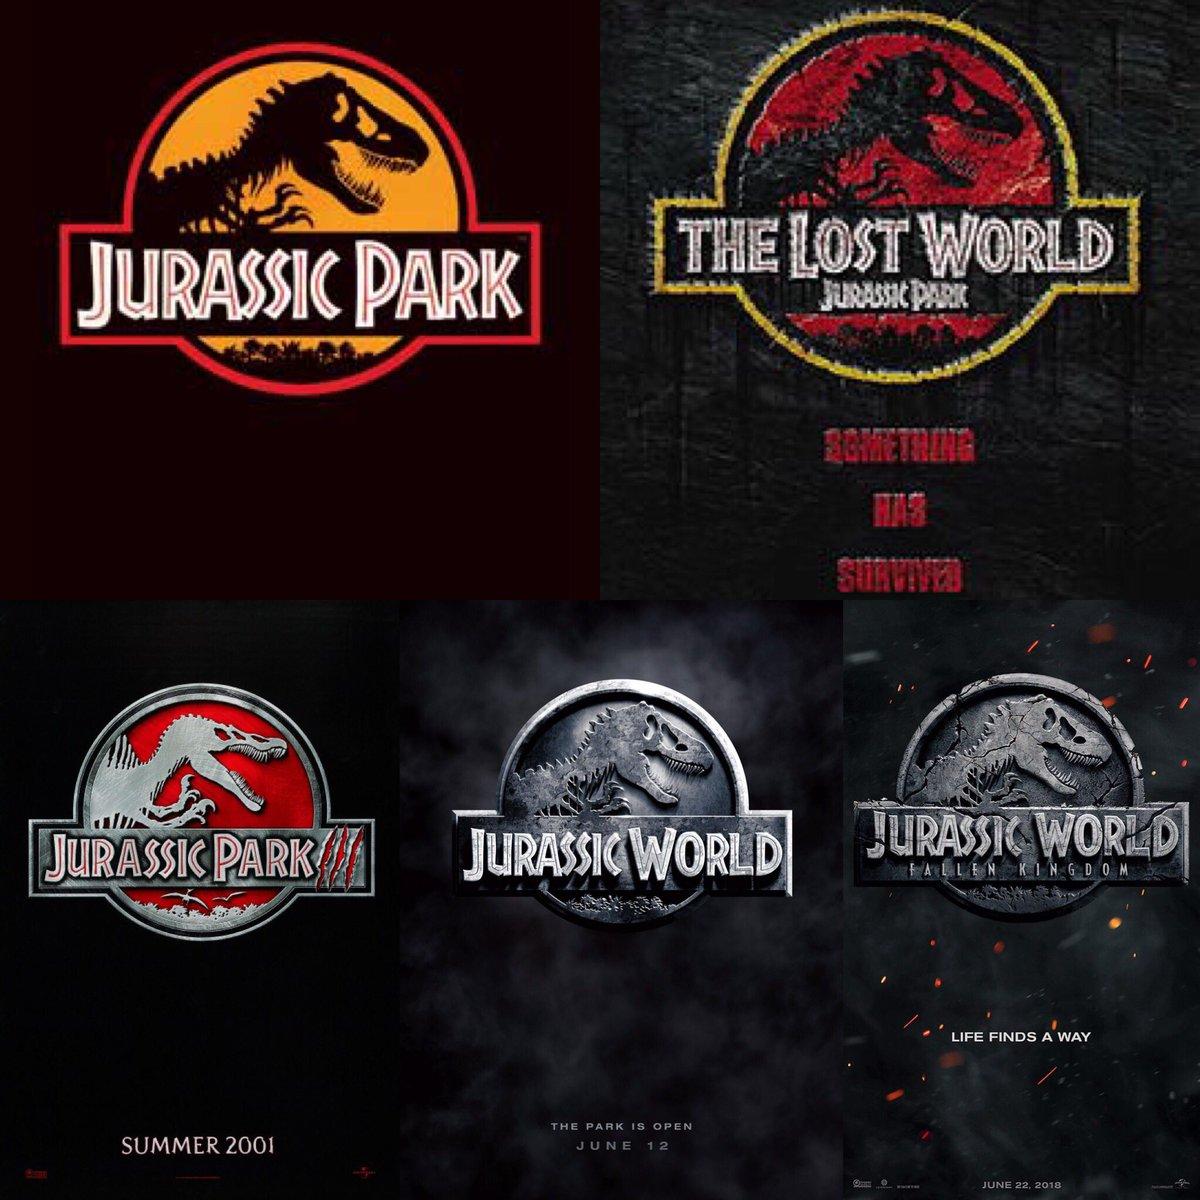 jurassicworld2018 on twitter quotjurassic park posters 1993